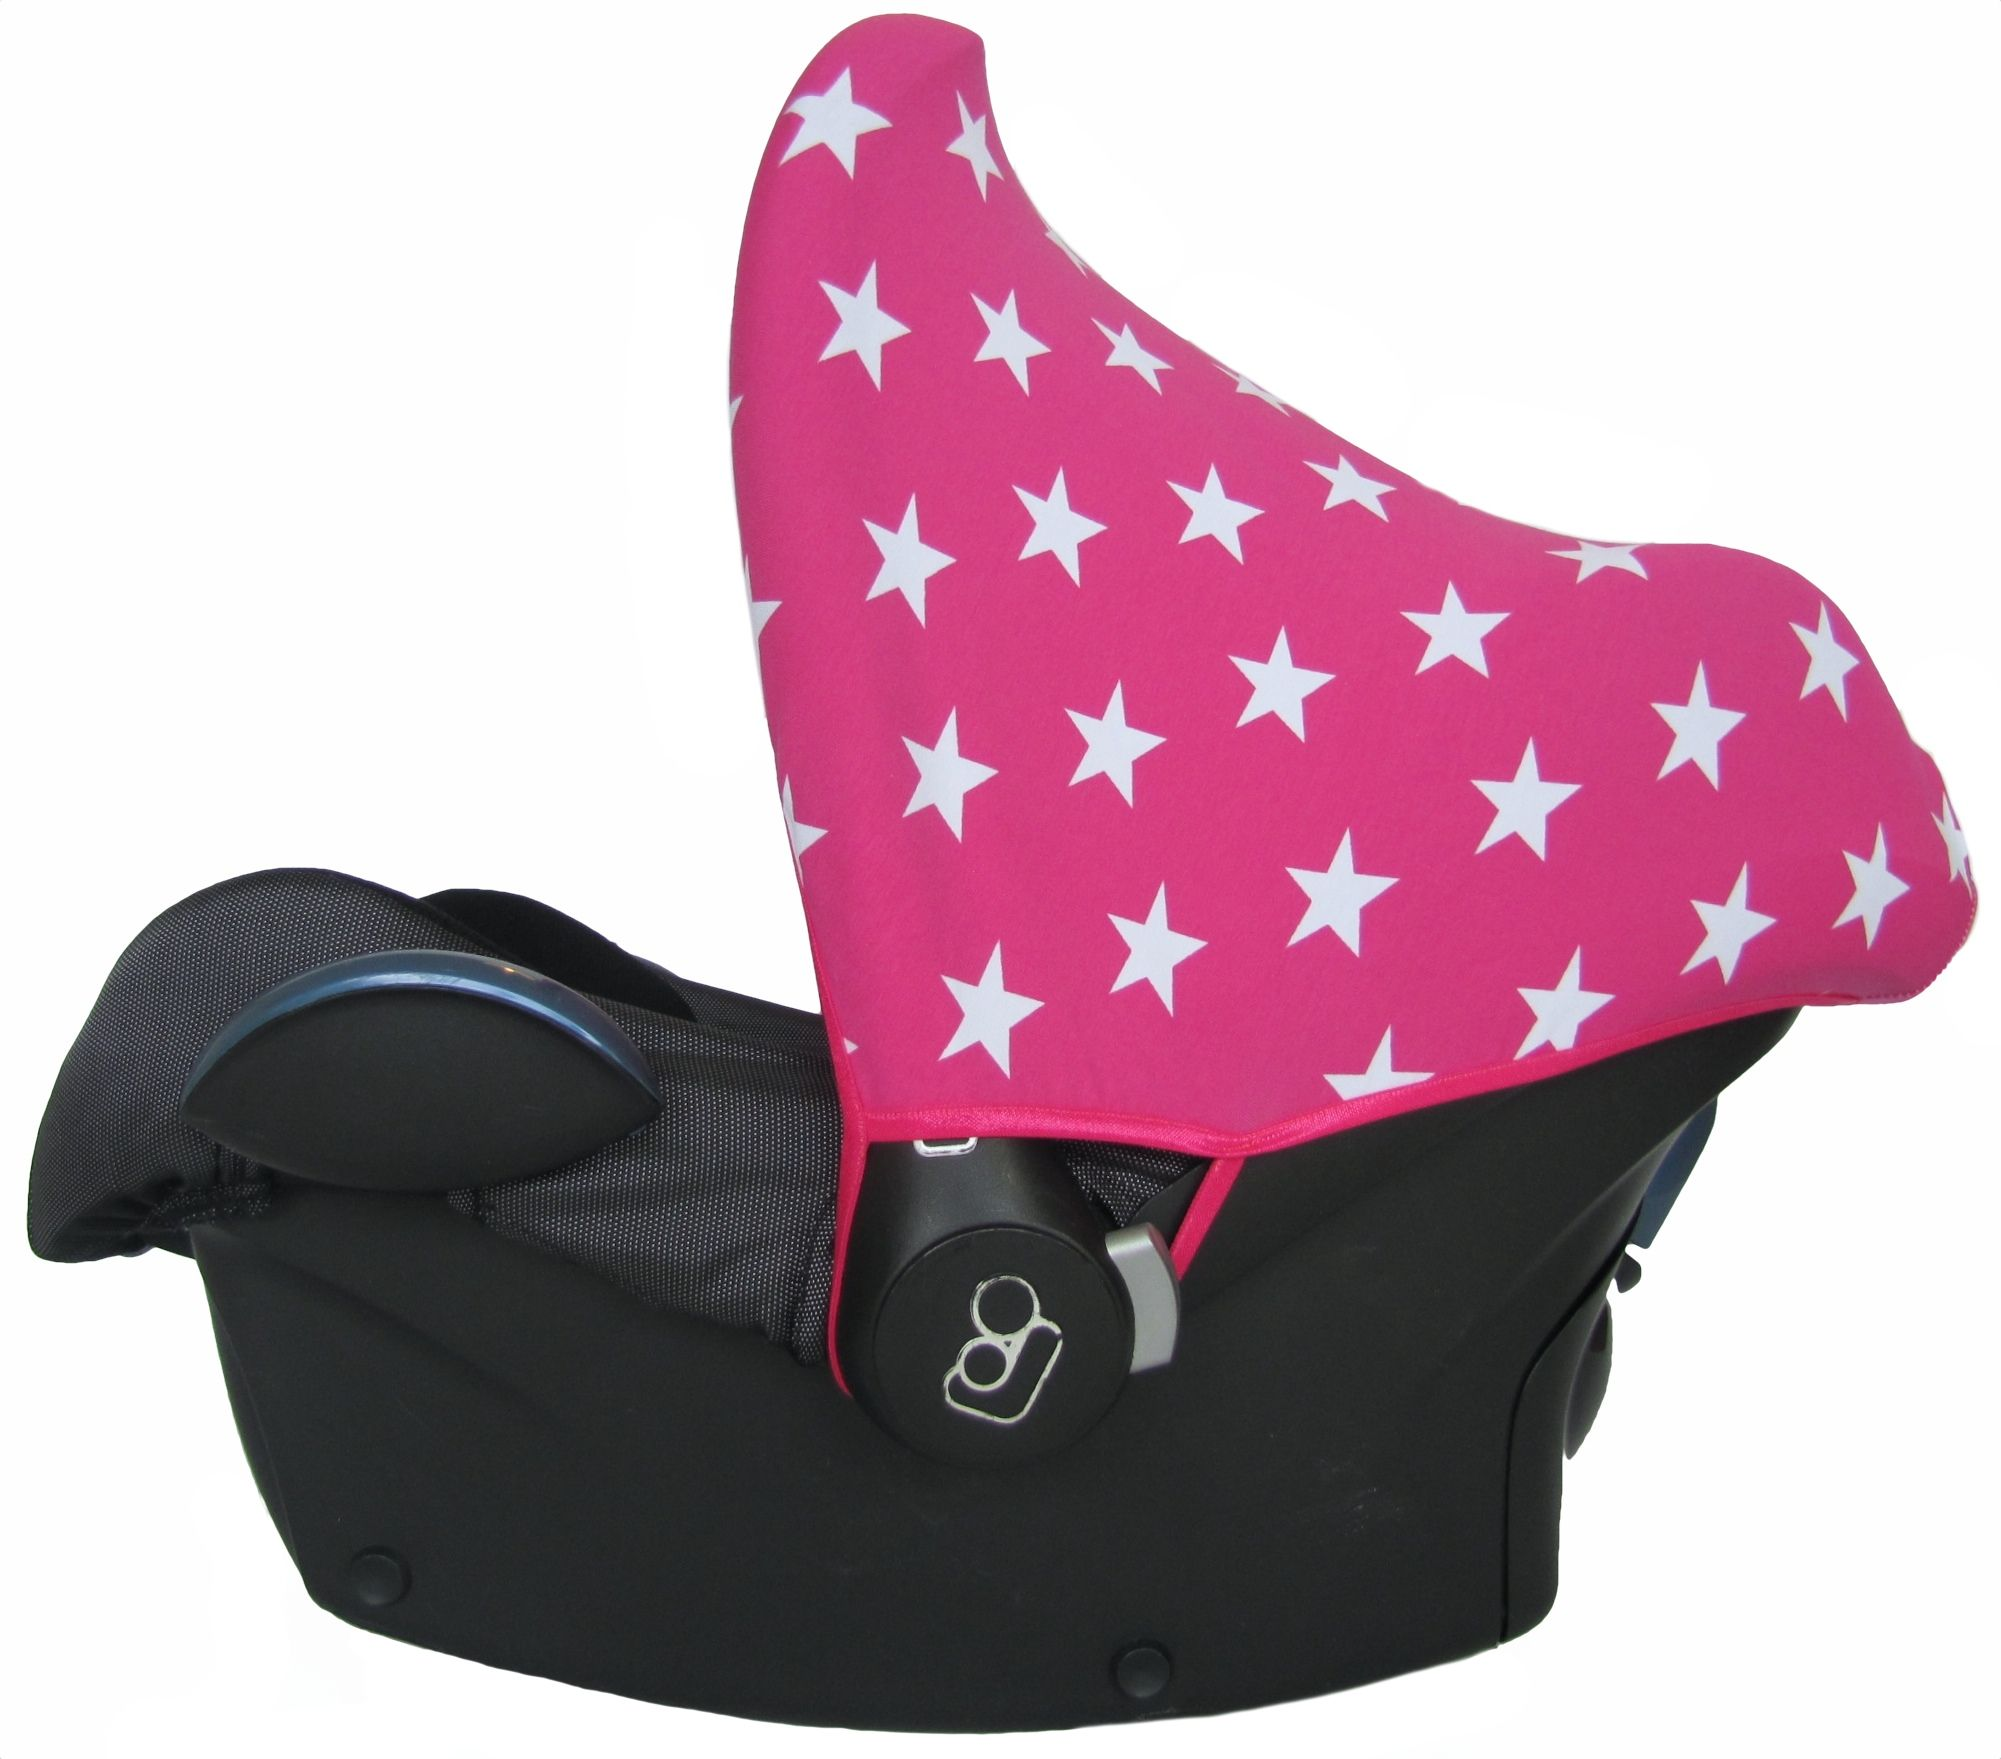 Priori Car Seat Cover